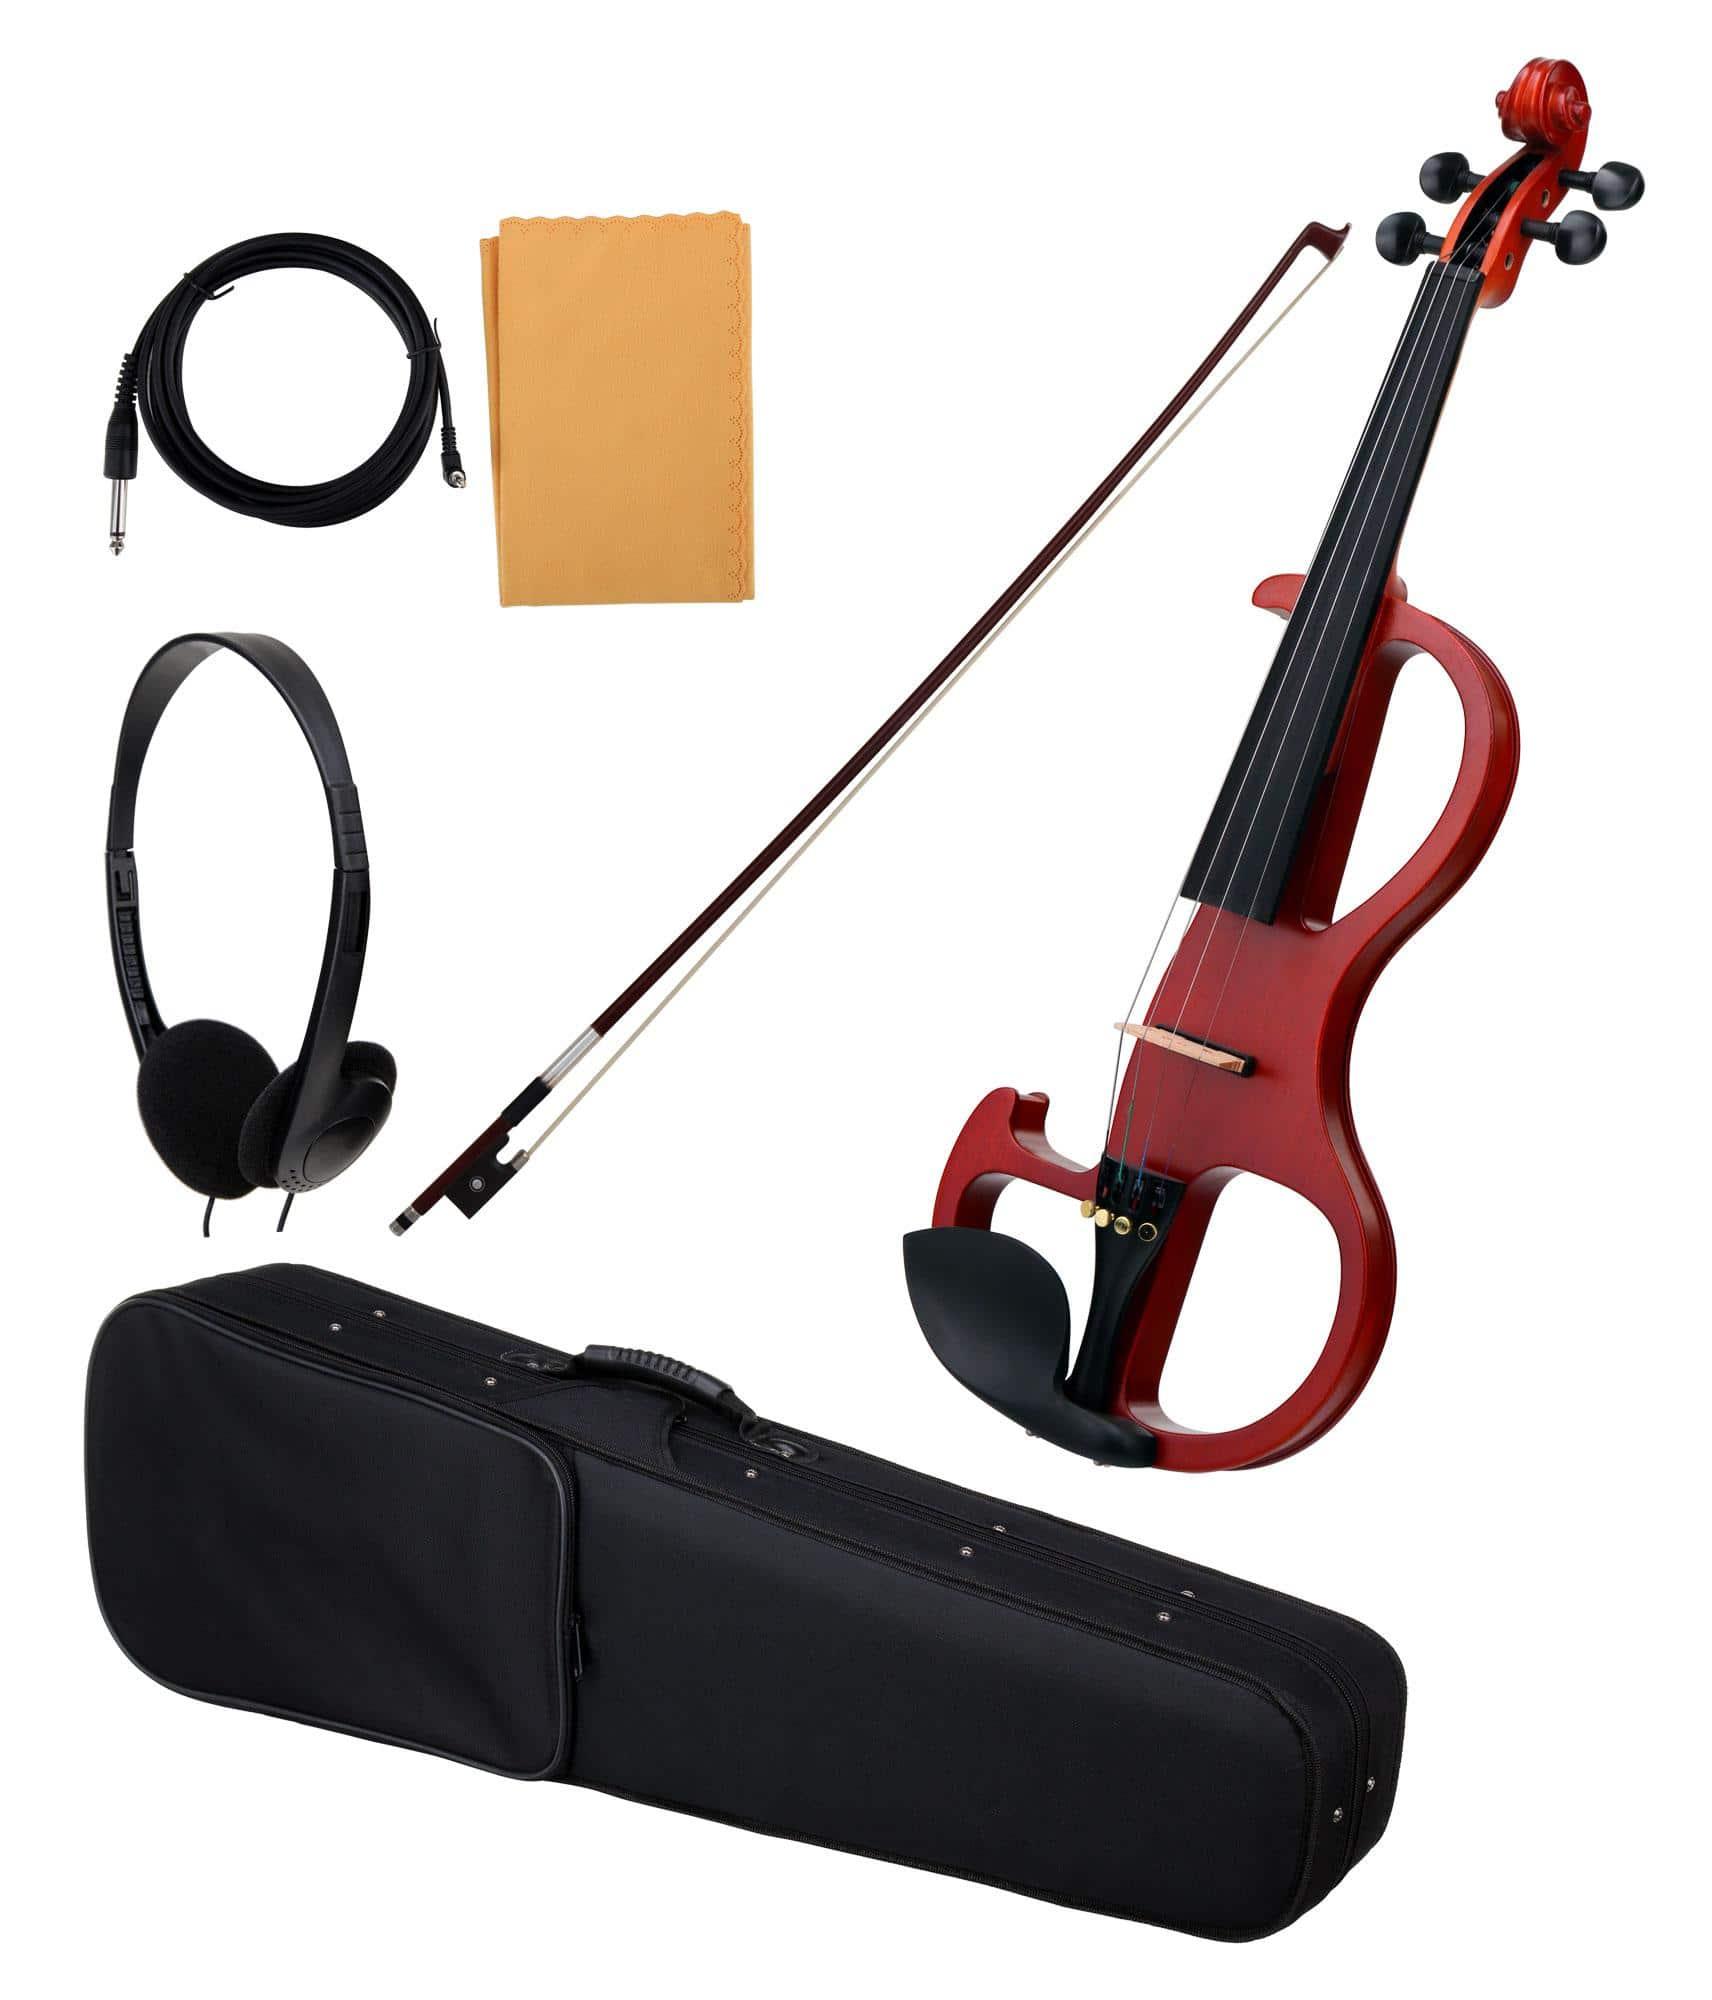 Violinen - Classic Cantabile EV 90 E Violine natur matt - Onlineshop Musikhaus Kirstein